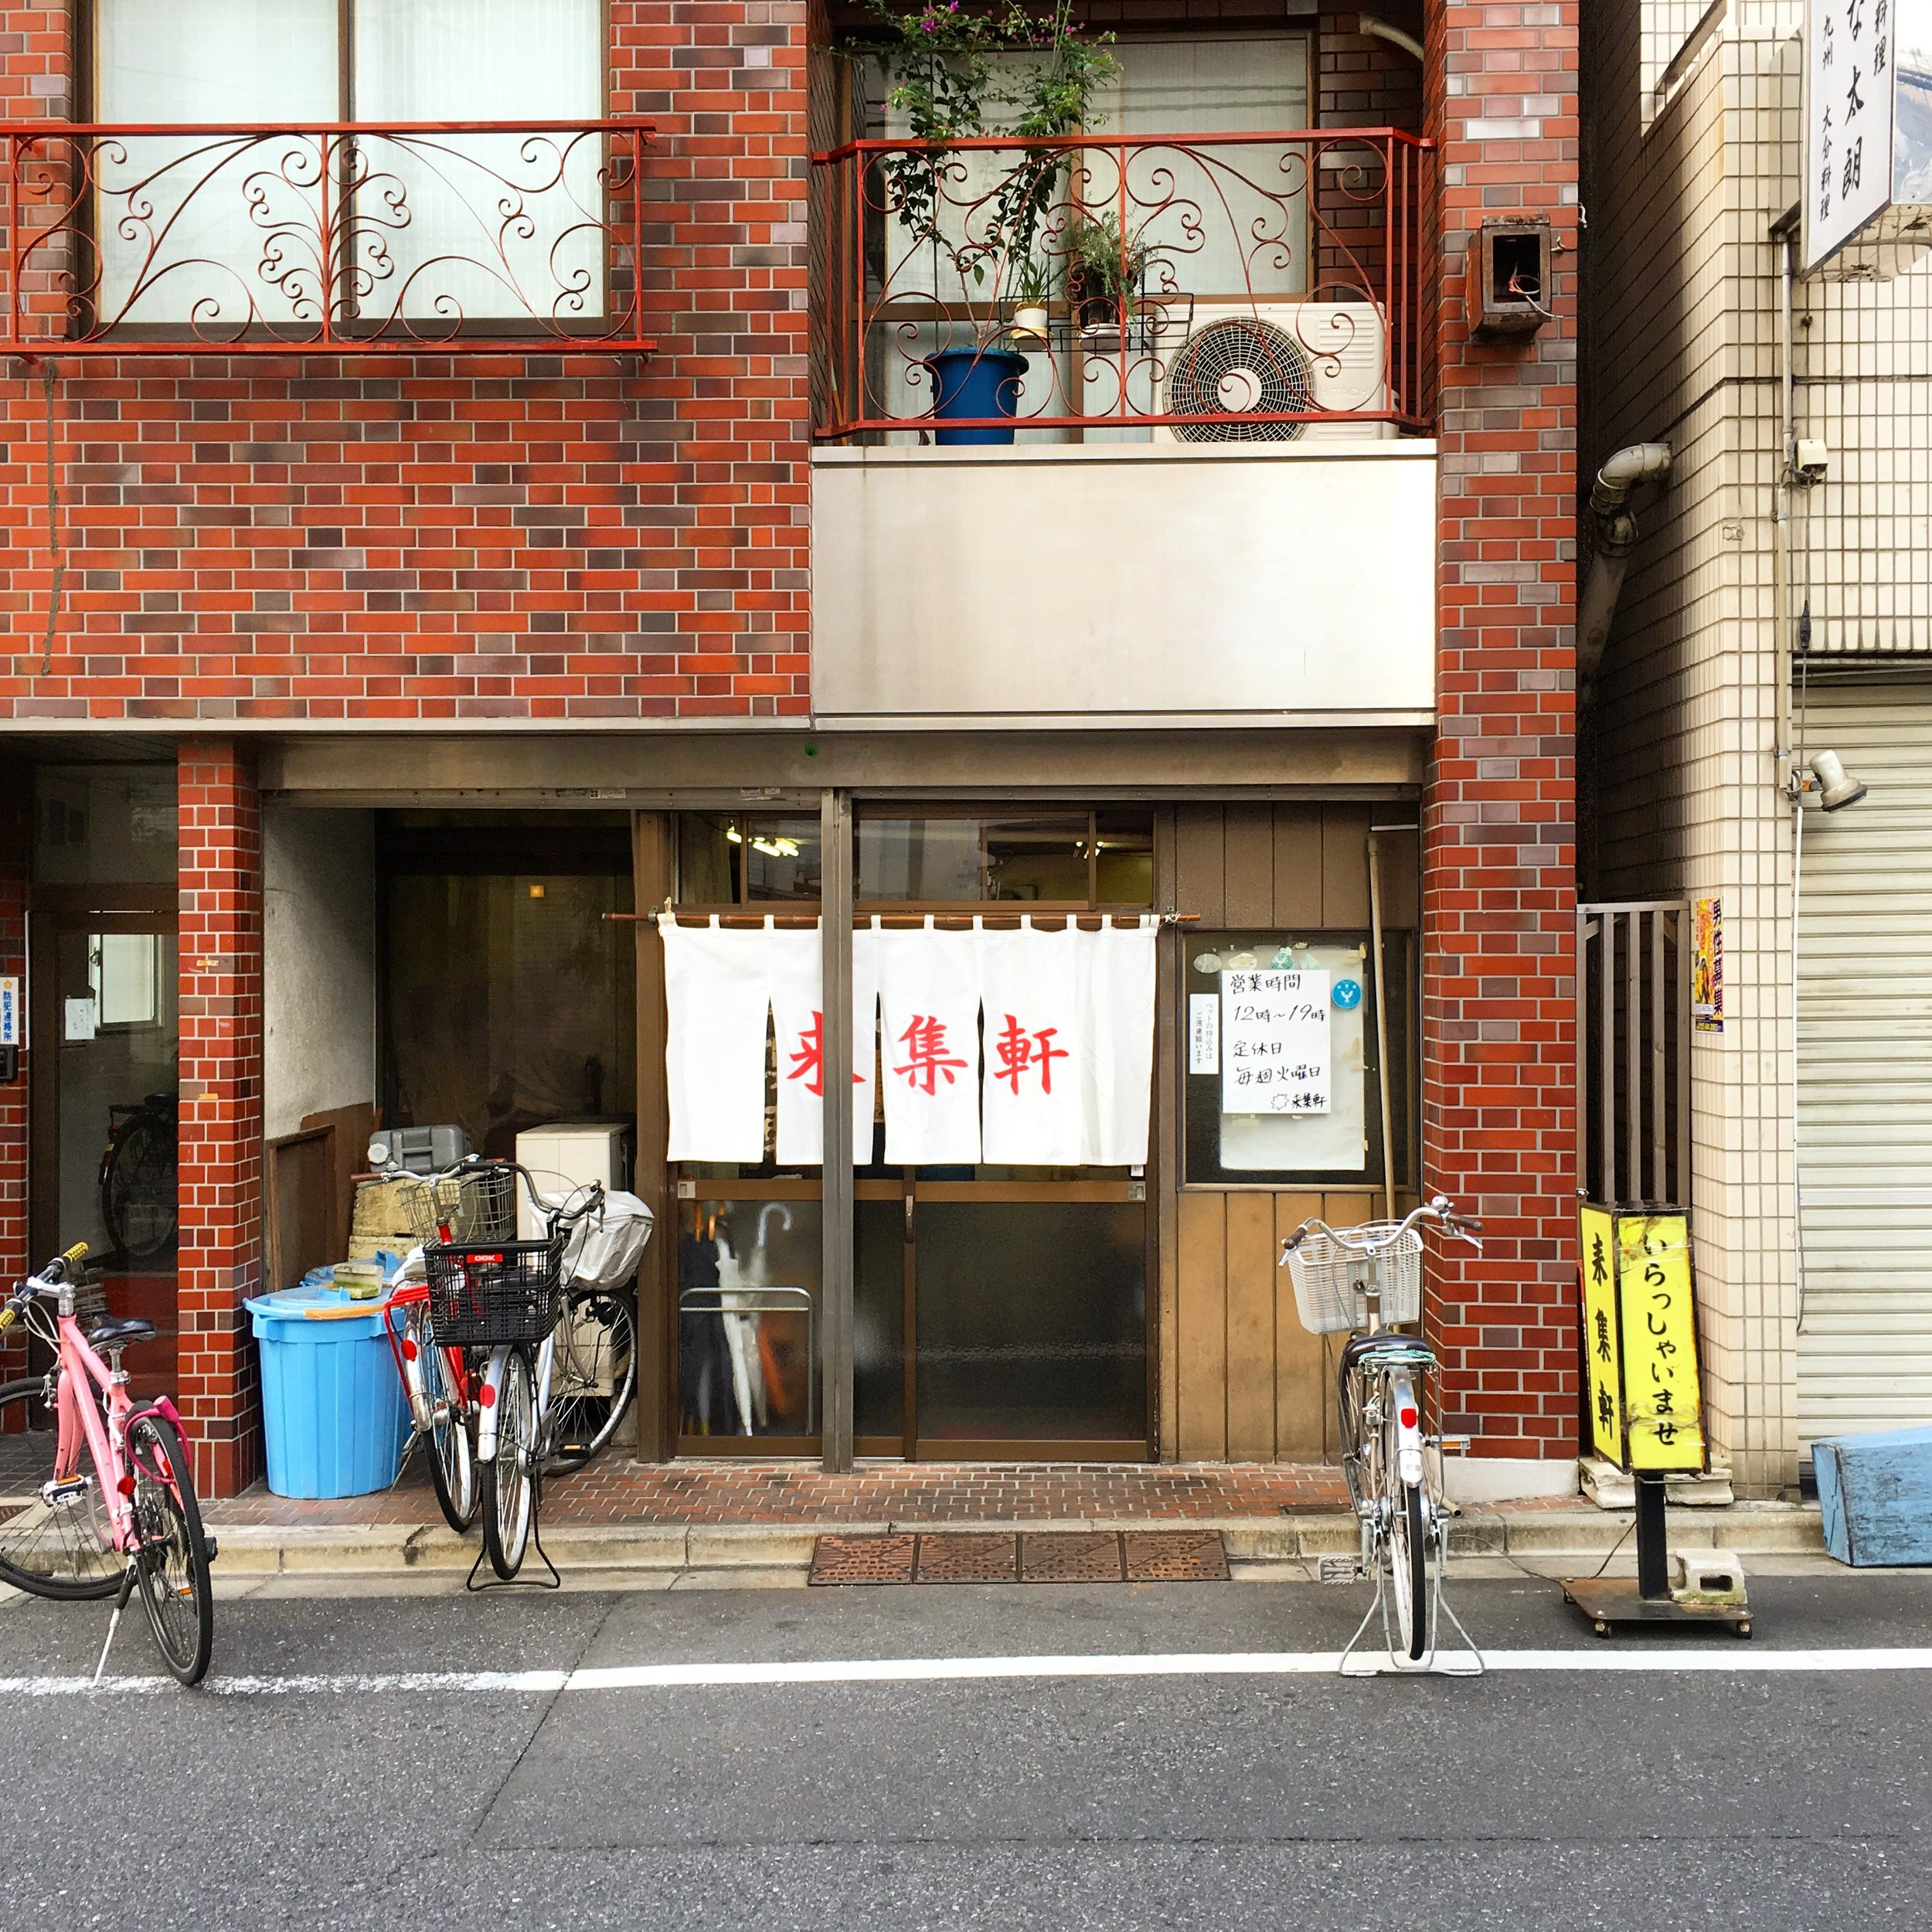 Raishuken Shop - Abram.jpg